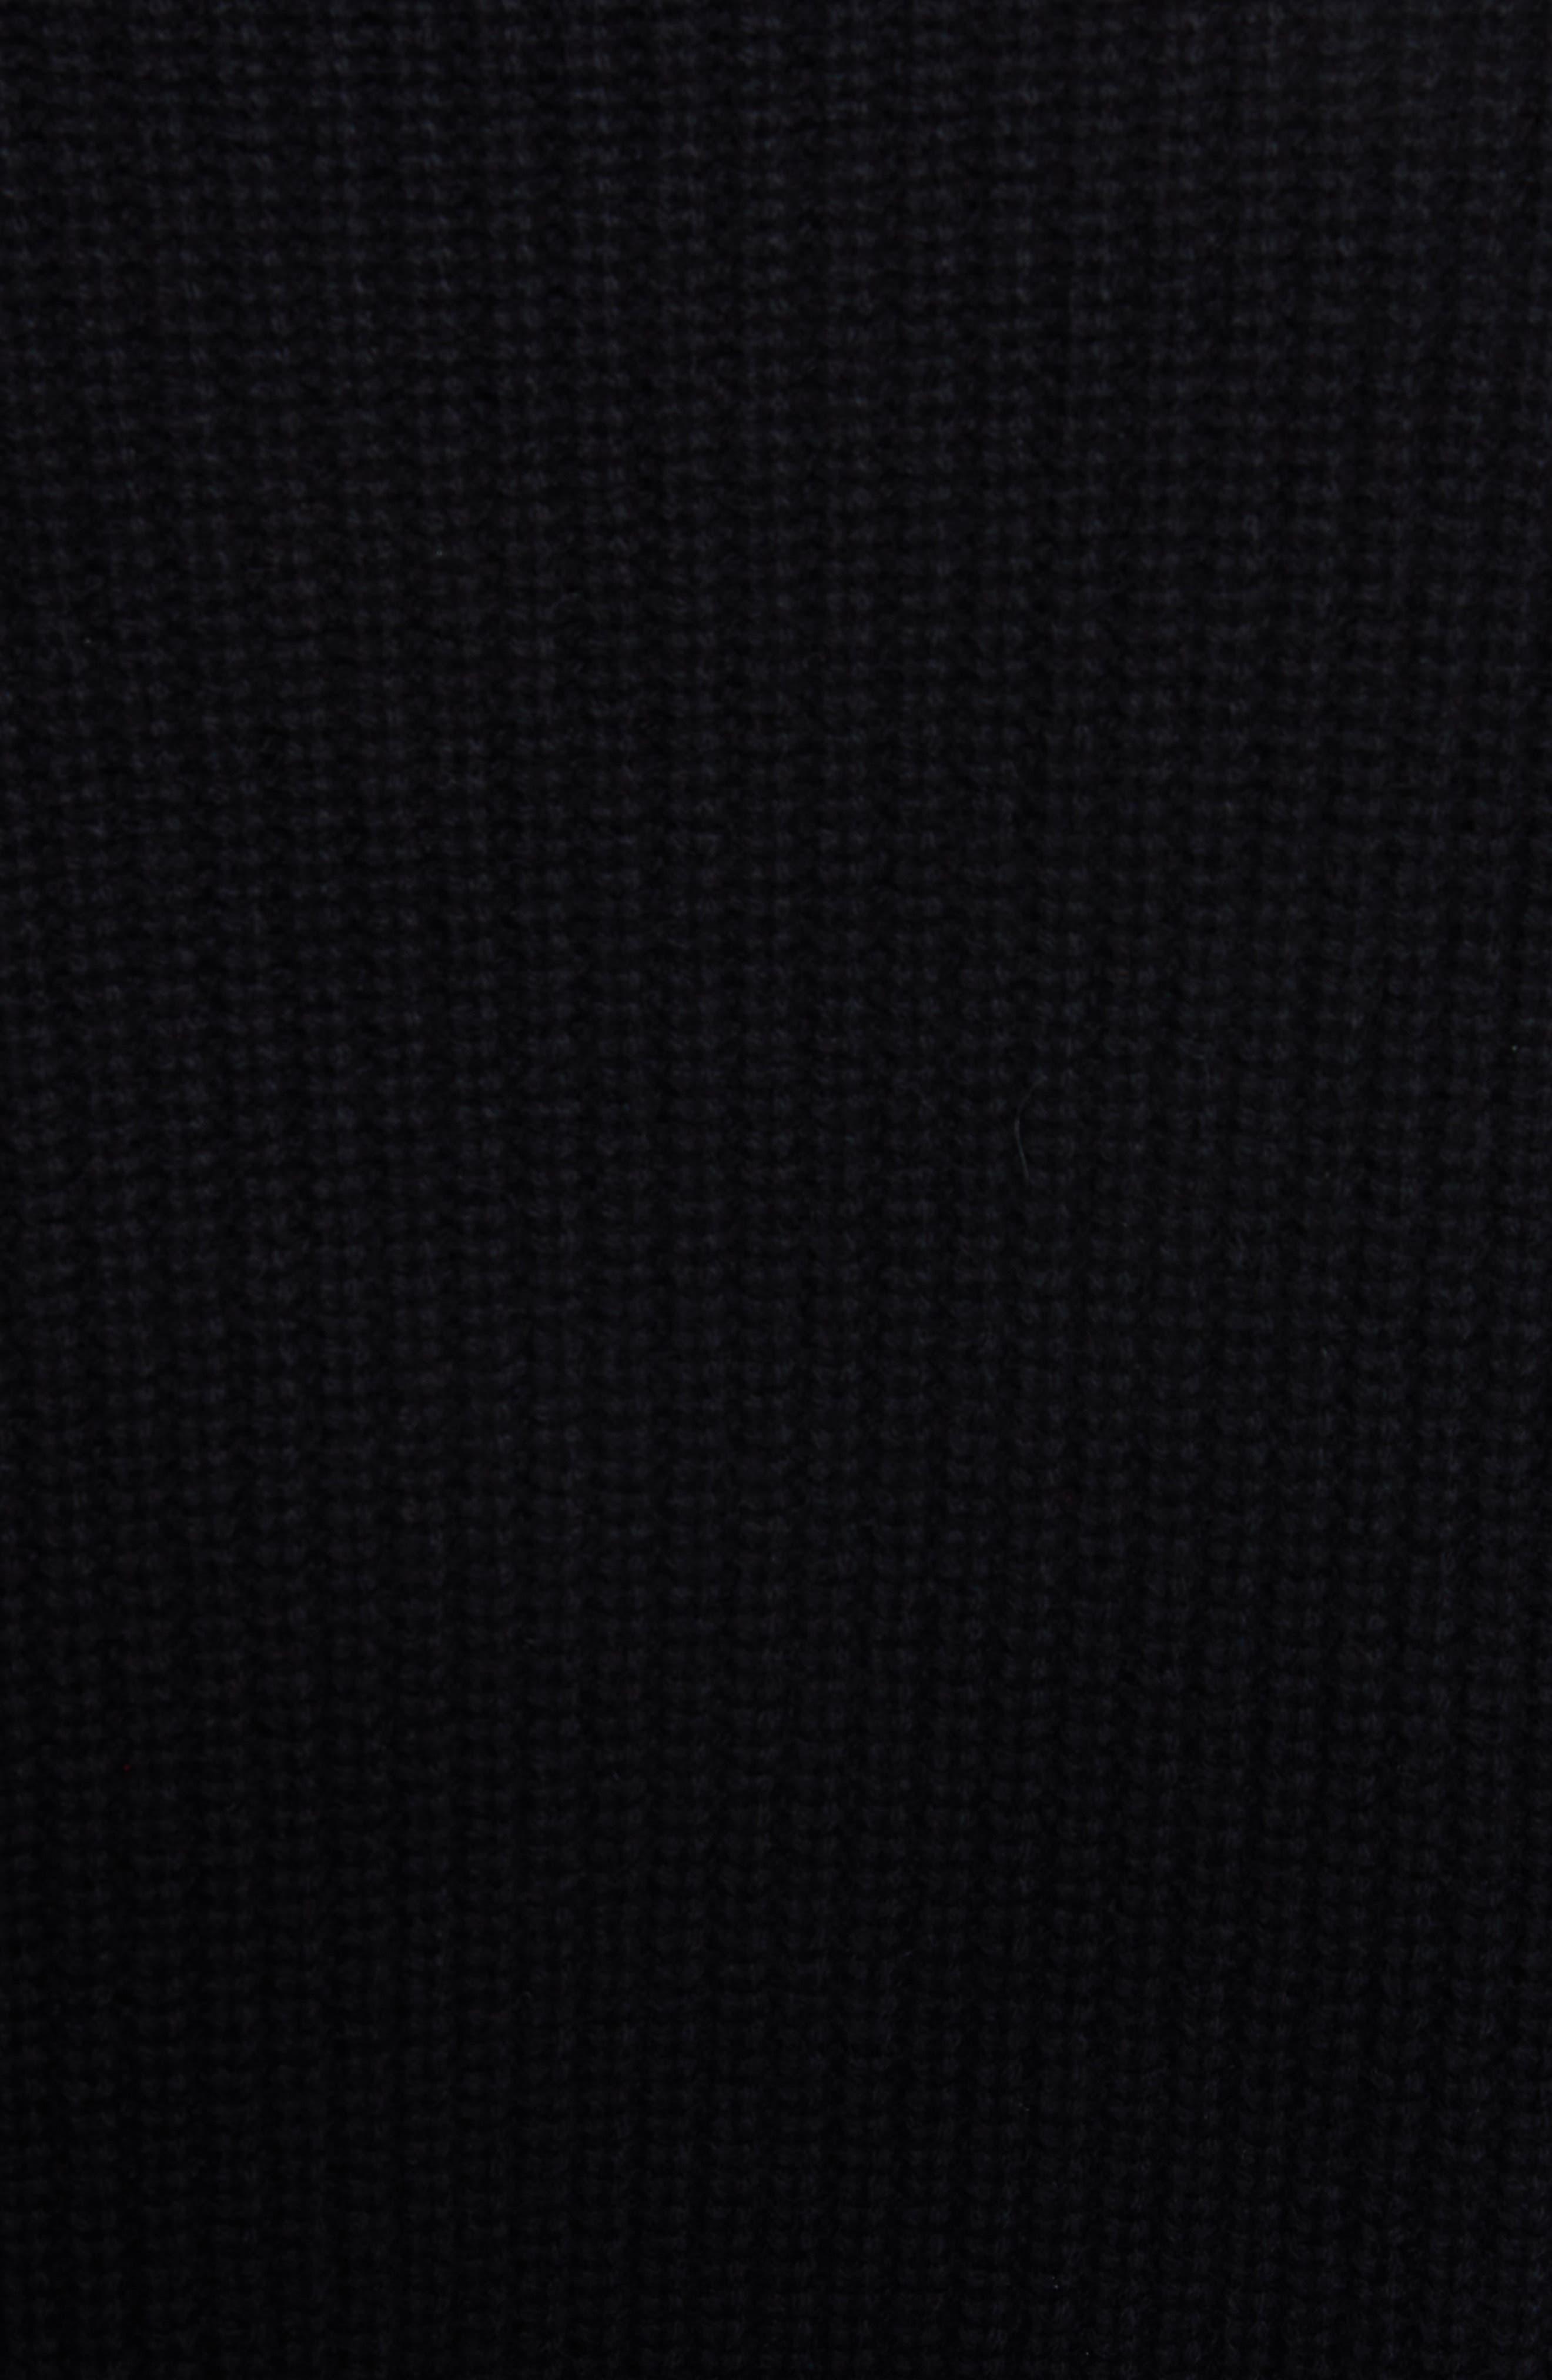 Crewneck Shaker Cashmere Sweater,                             Alternate thumbnail 5, color,                             BLACK